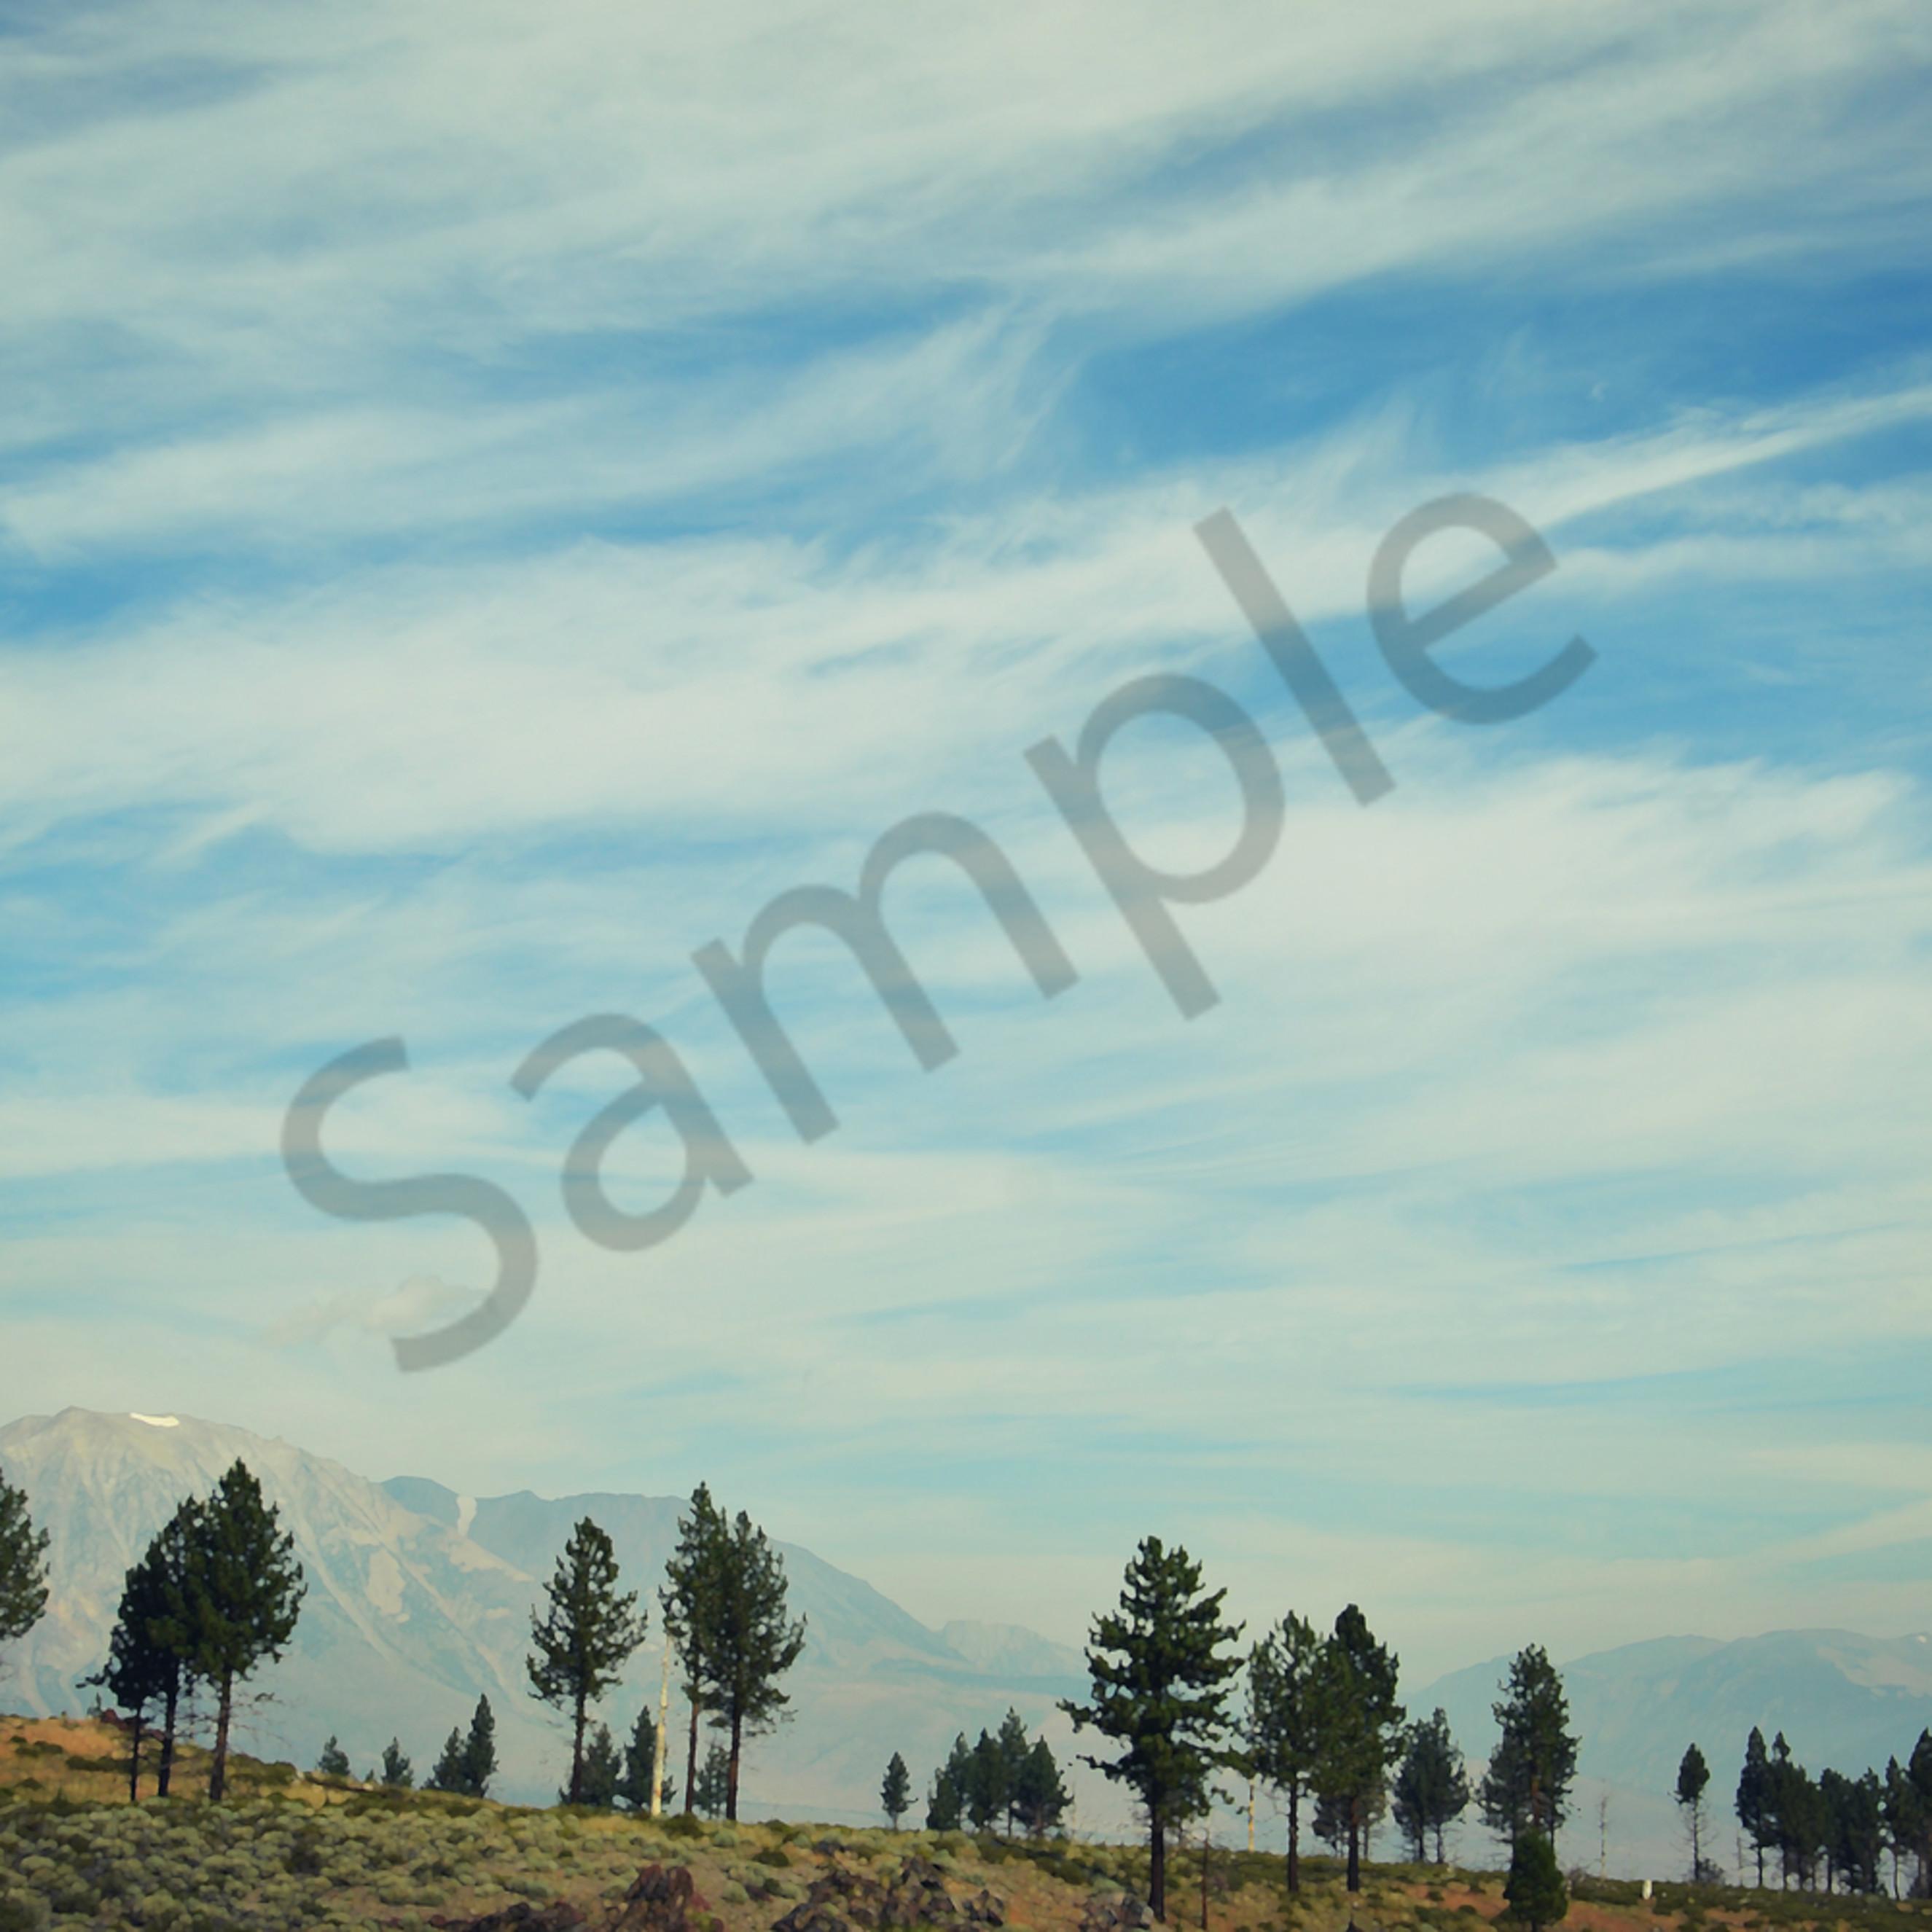 Sts 3478 mammoth landscape 2018   ps paint daubs jennifer effect tag art4theglryofgod by sharon vpdkjw